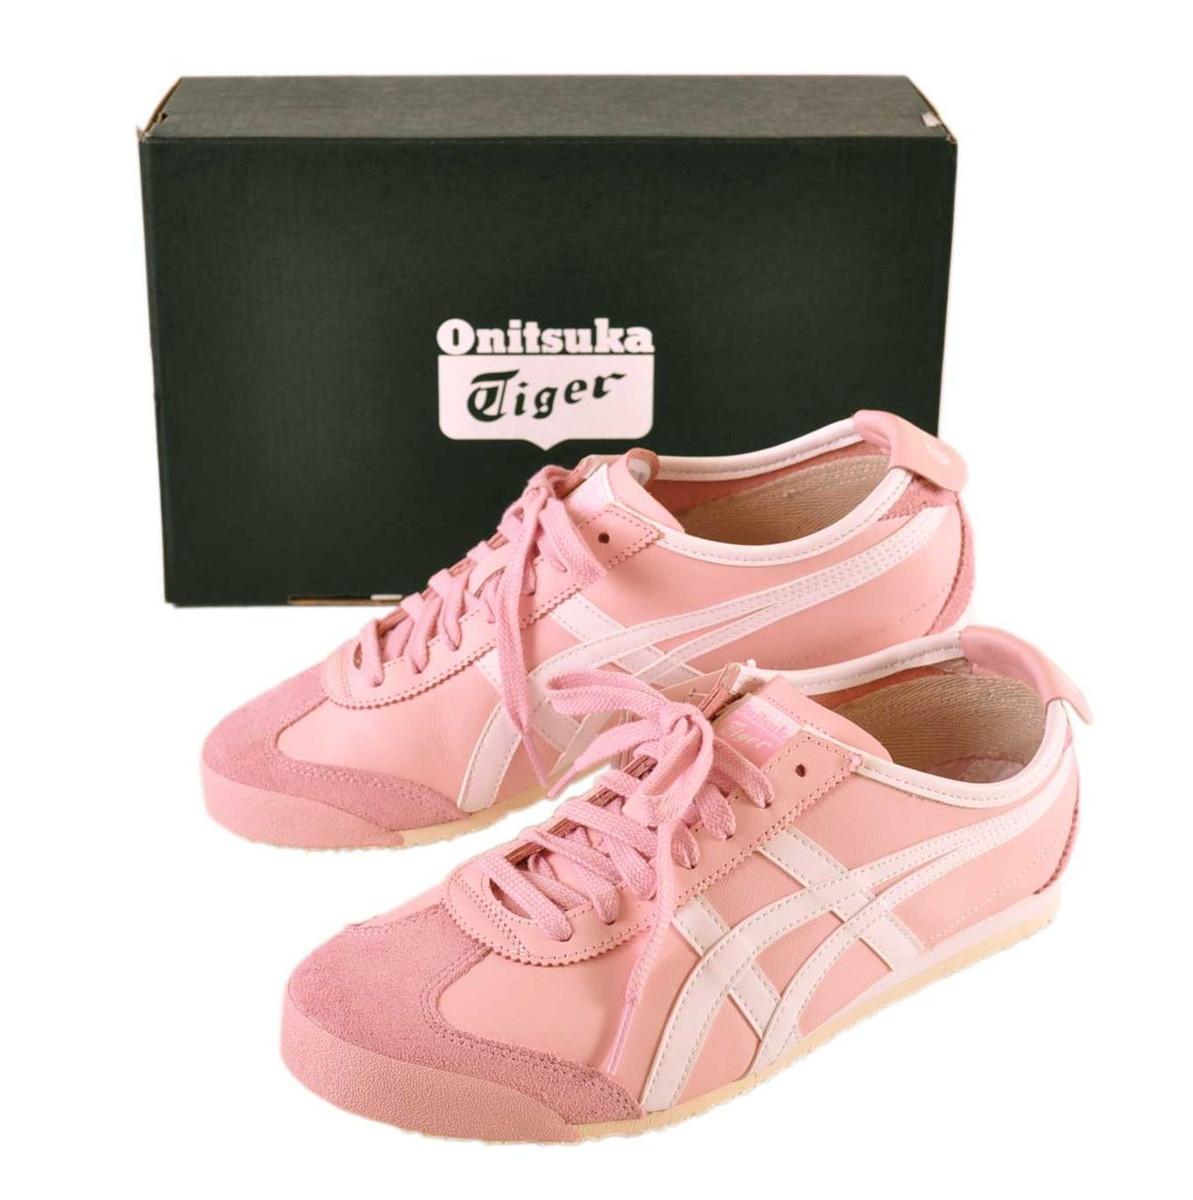 onitsuka tiger mexico 66 pink jersey